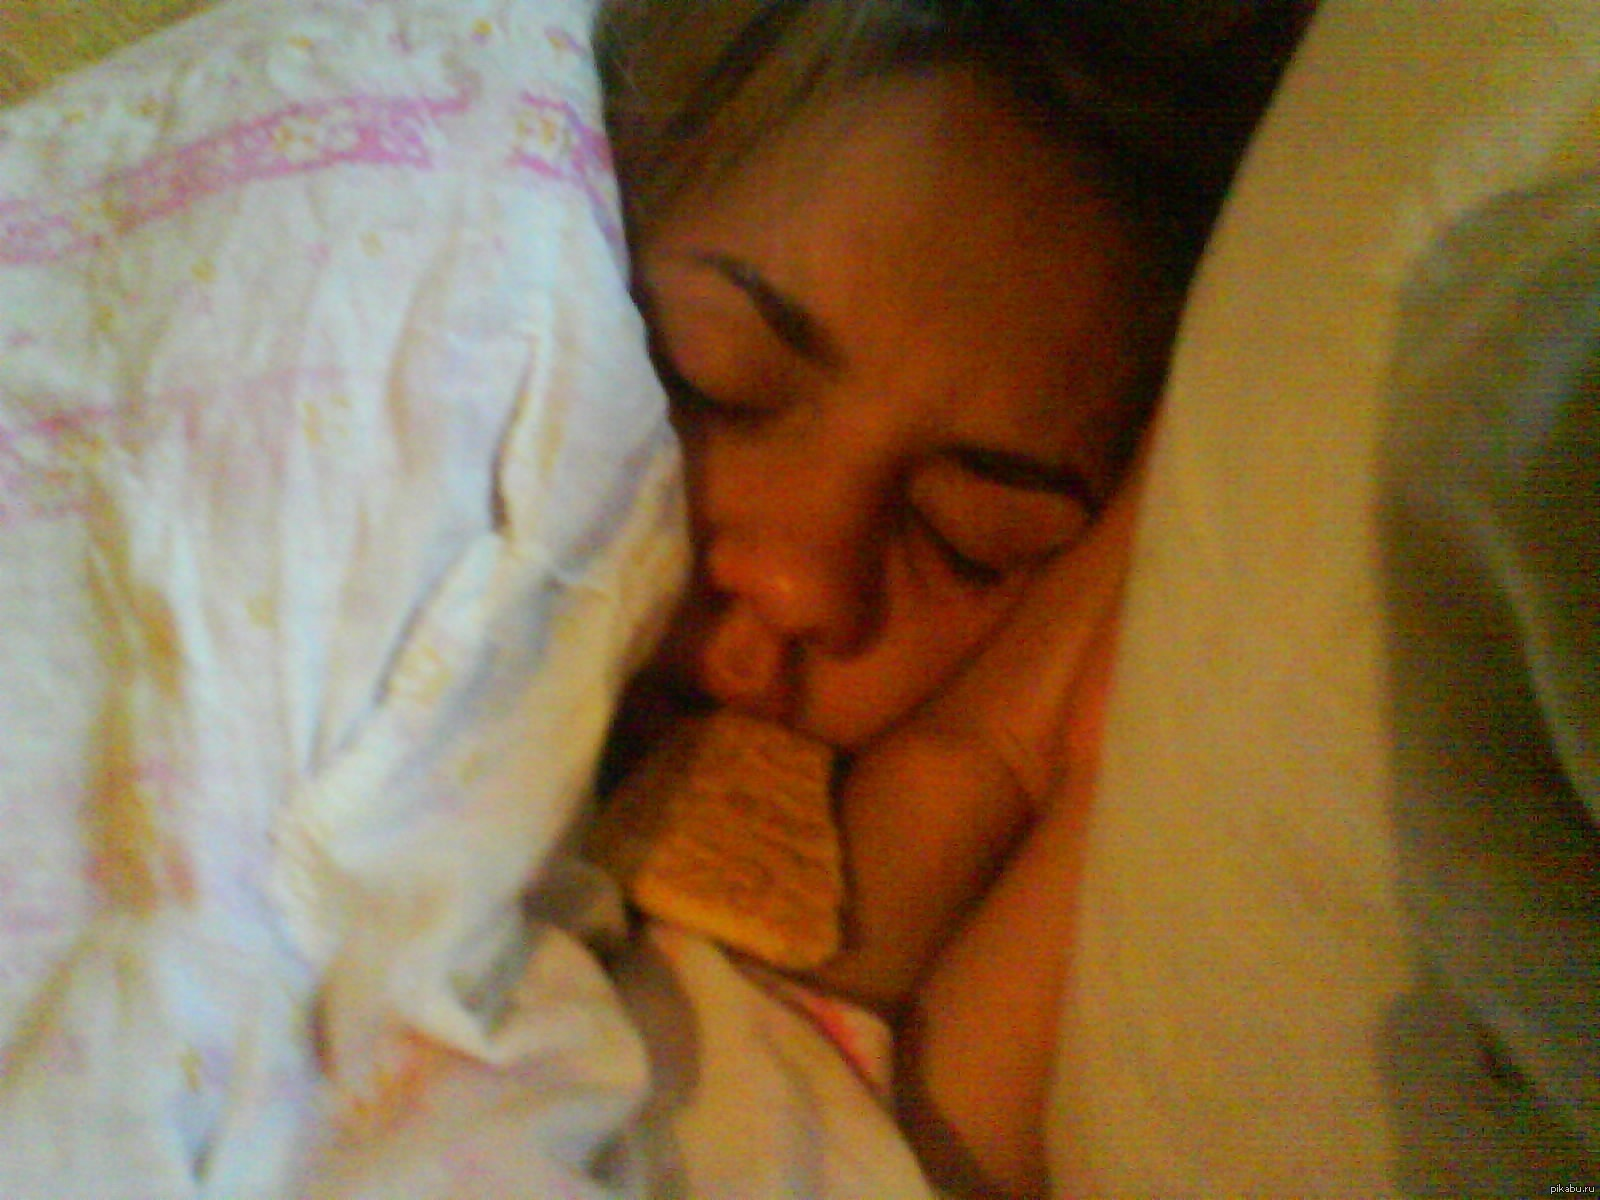 Сын лижет матери пока она спит 18 фотография